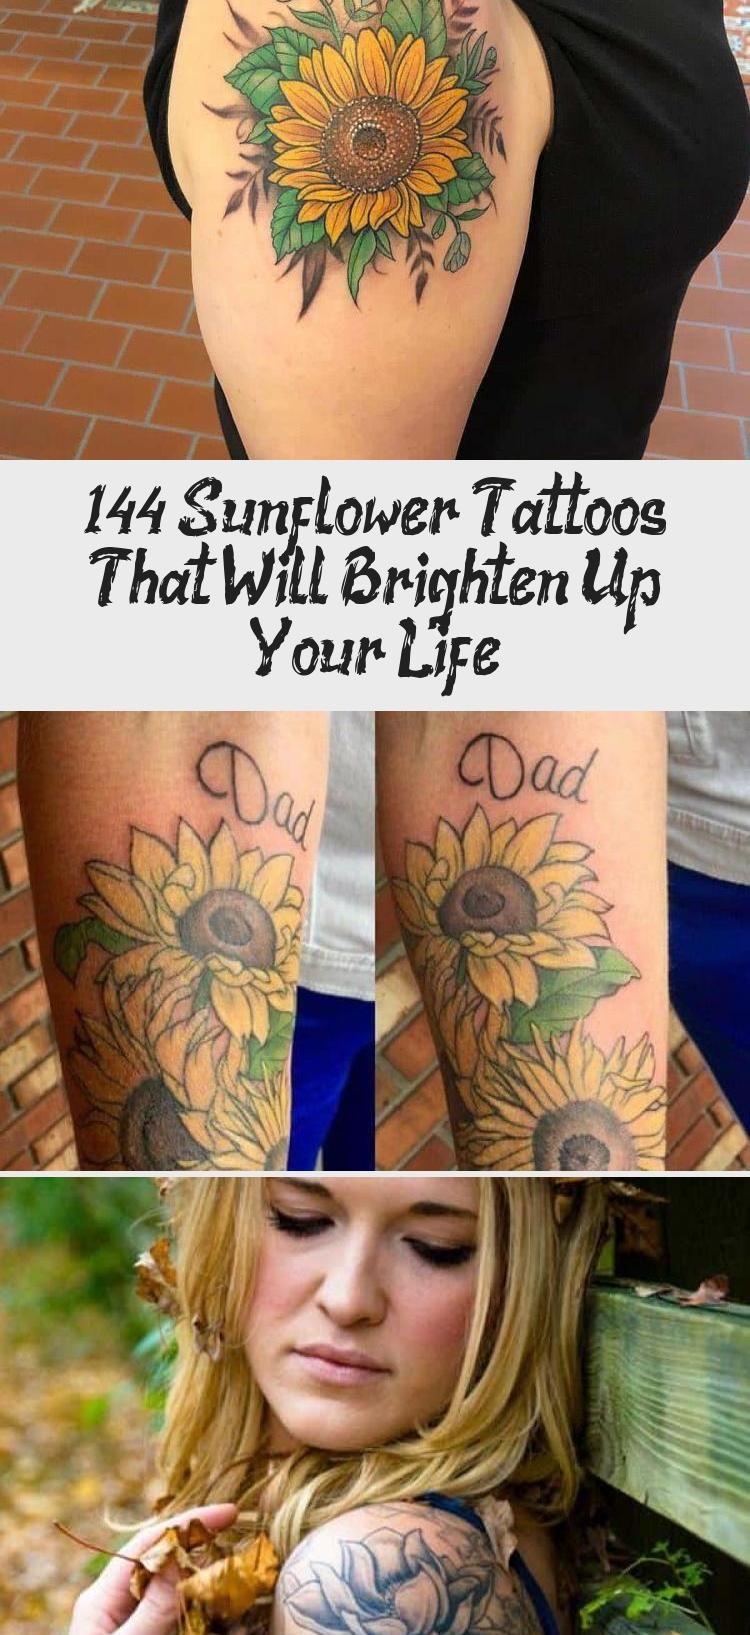 Photo of 144 Sunflower Tattoos That Will Brighten Up Your Life #Wildsunflowertattoos #Ele…